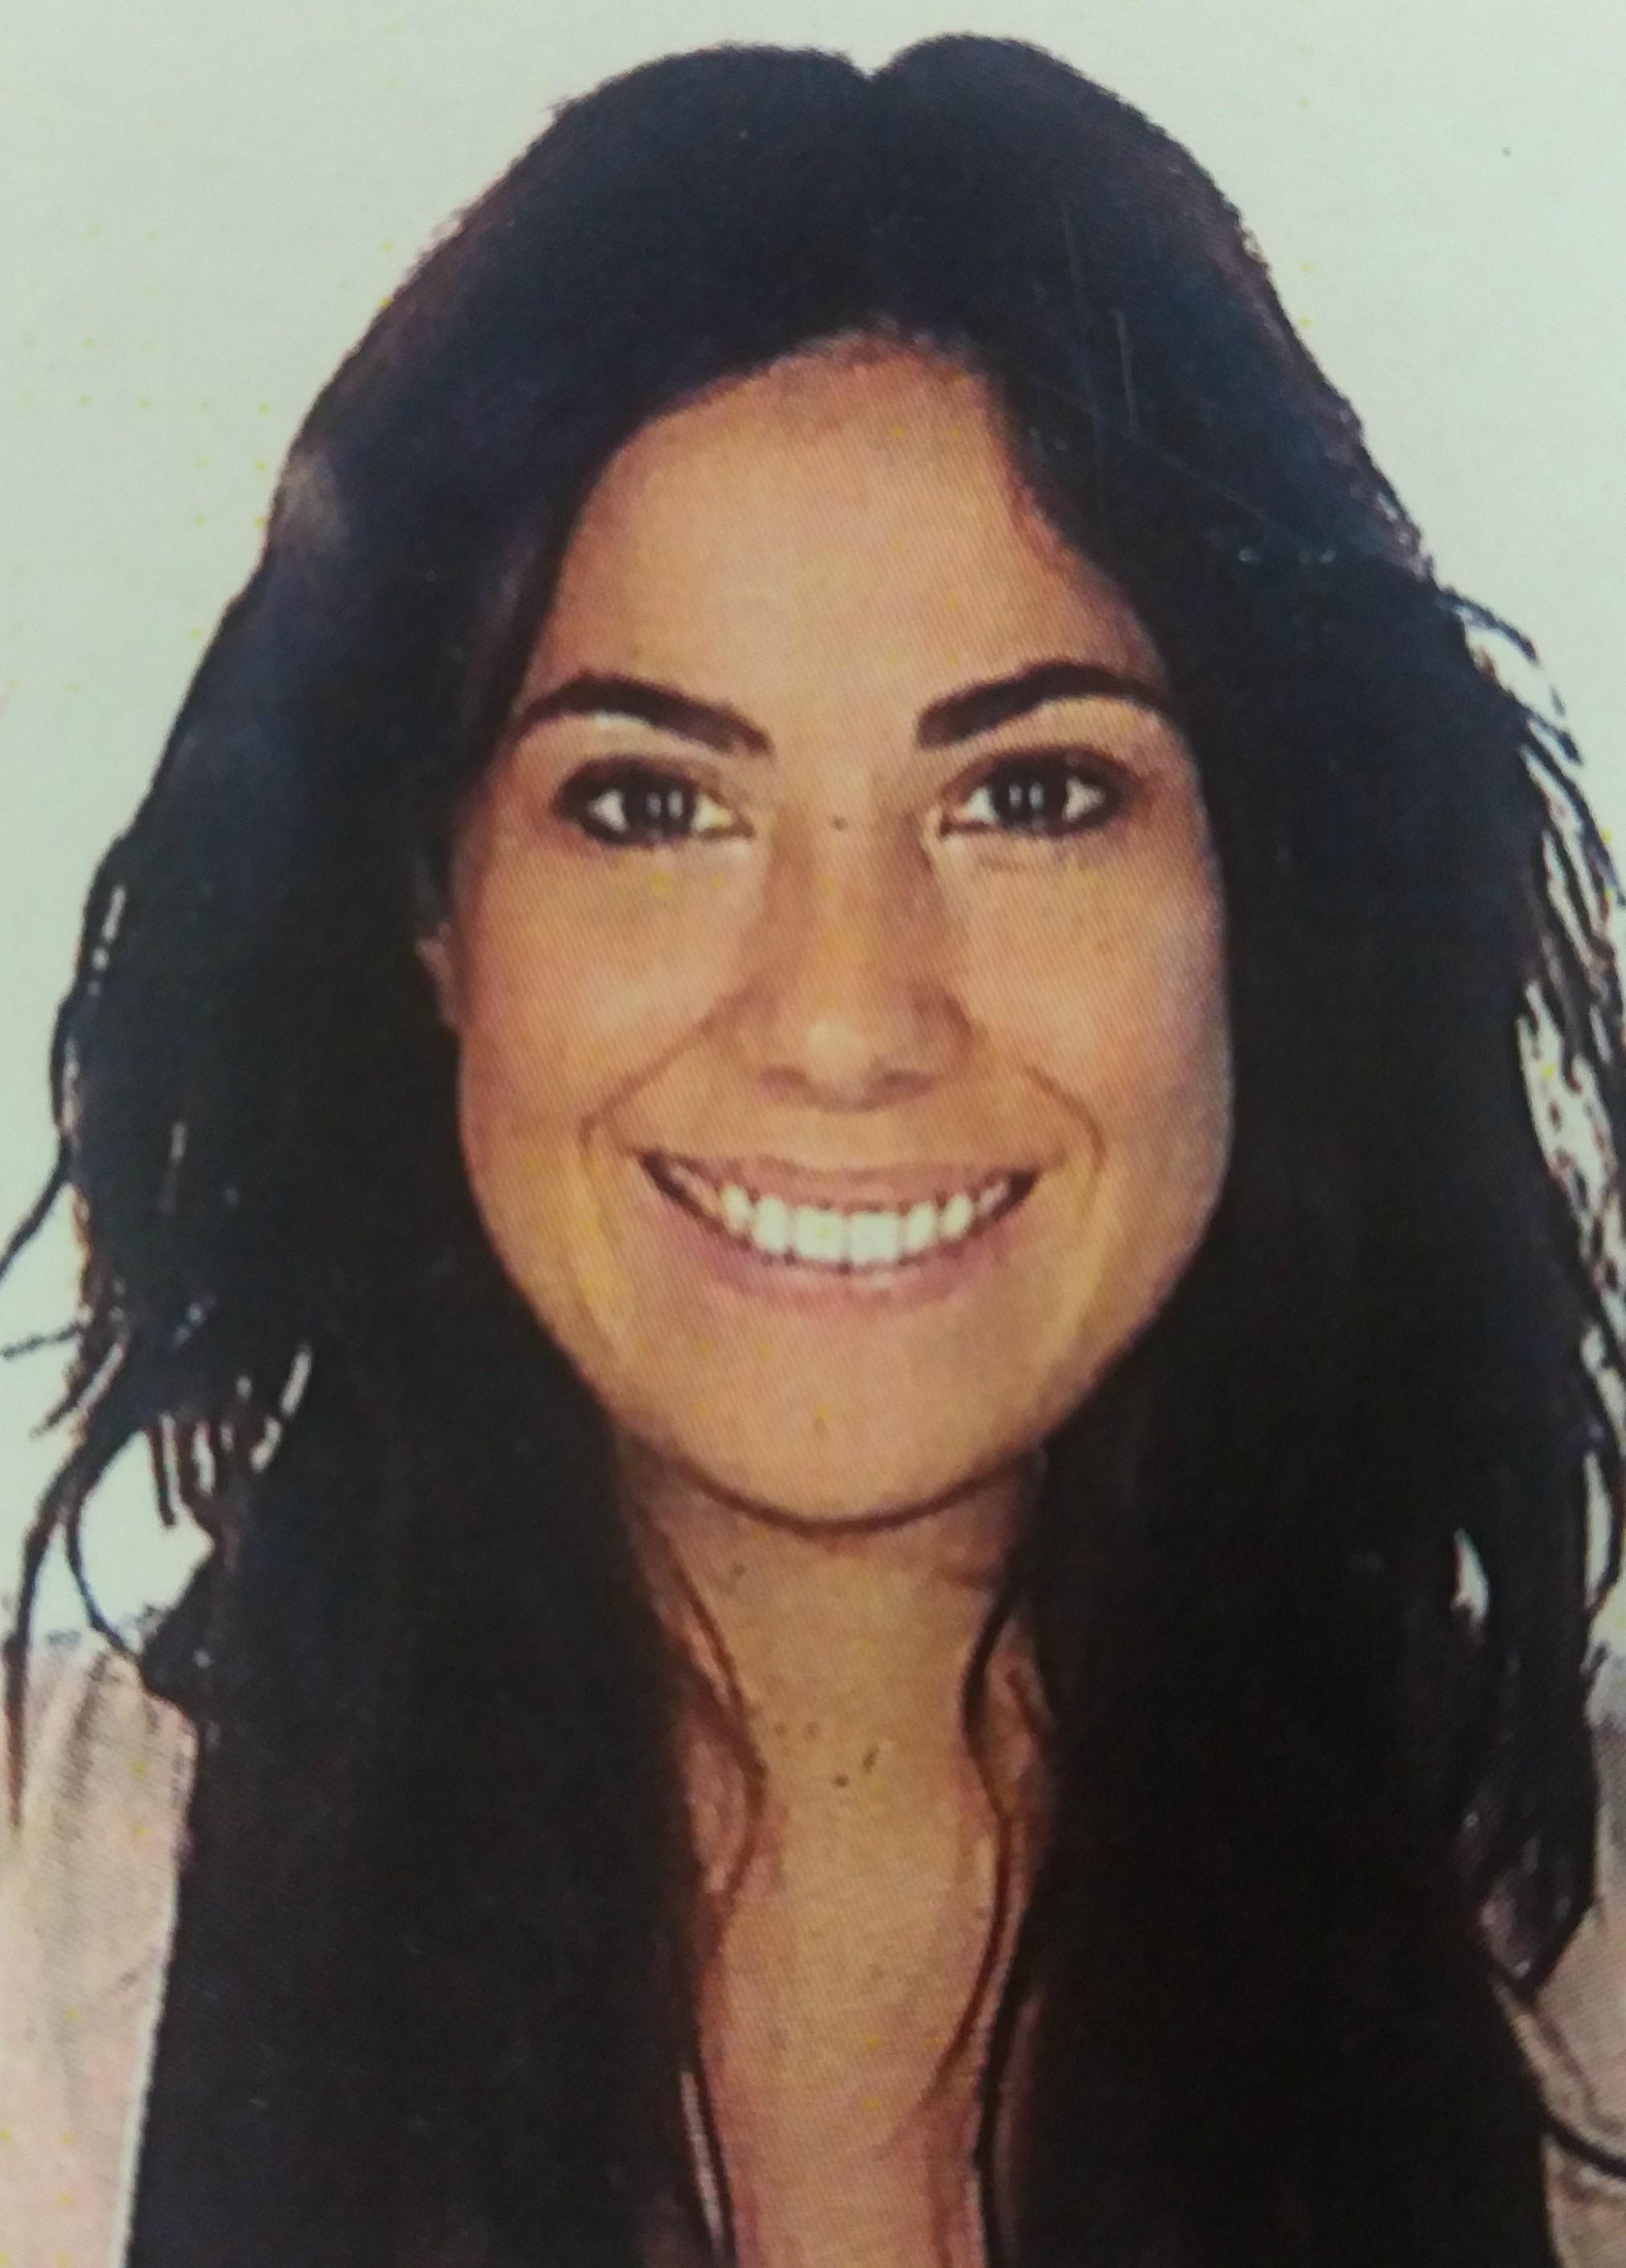 María Saavedra